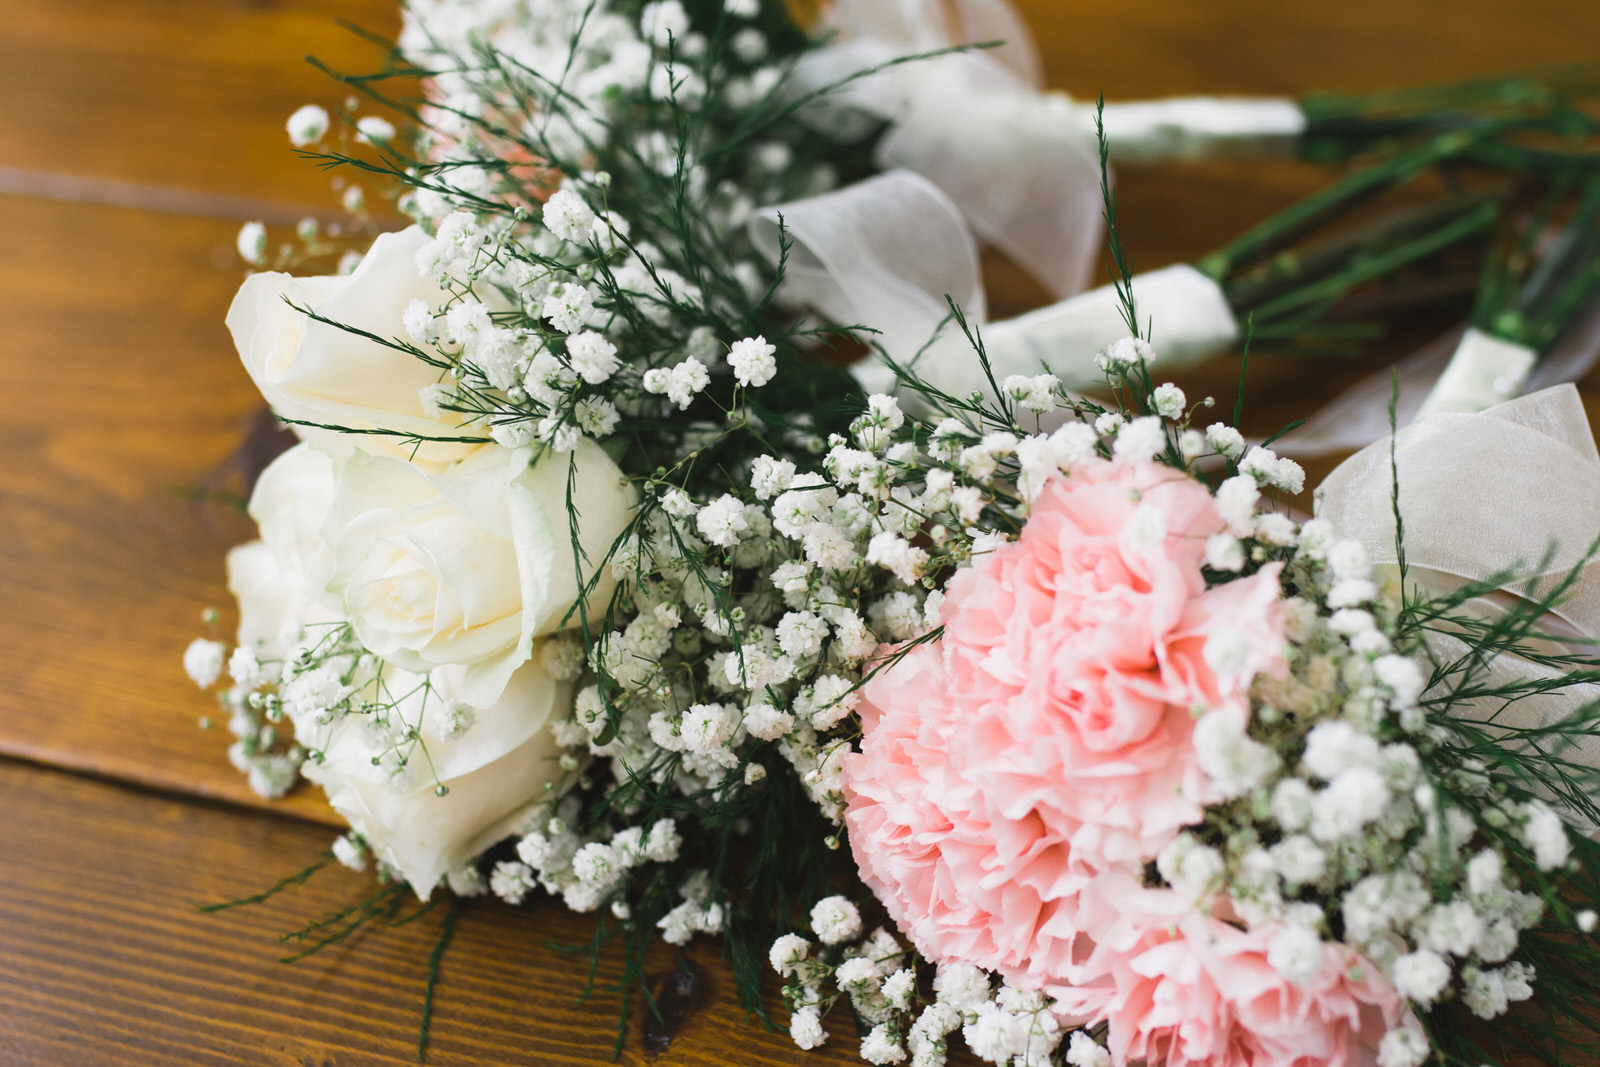 Mike_&_Barbaras_Wedding_3_24_2018-35.jpg